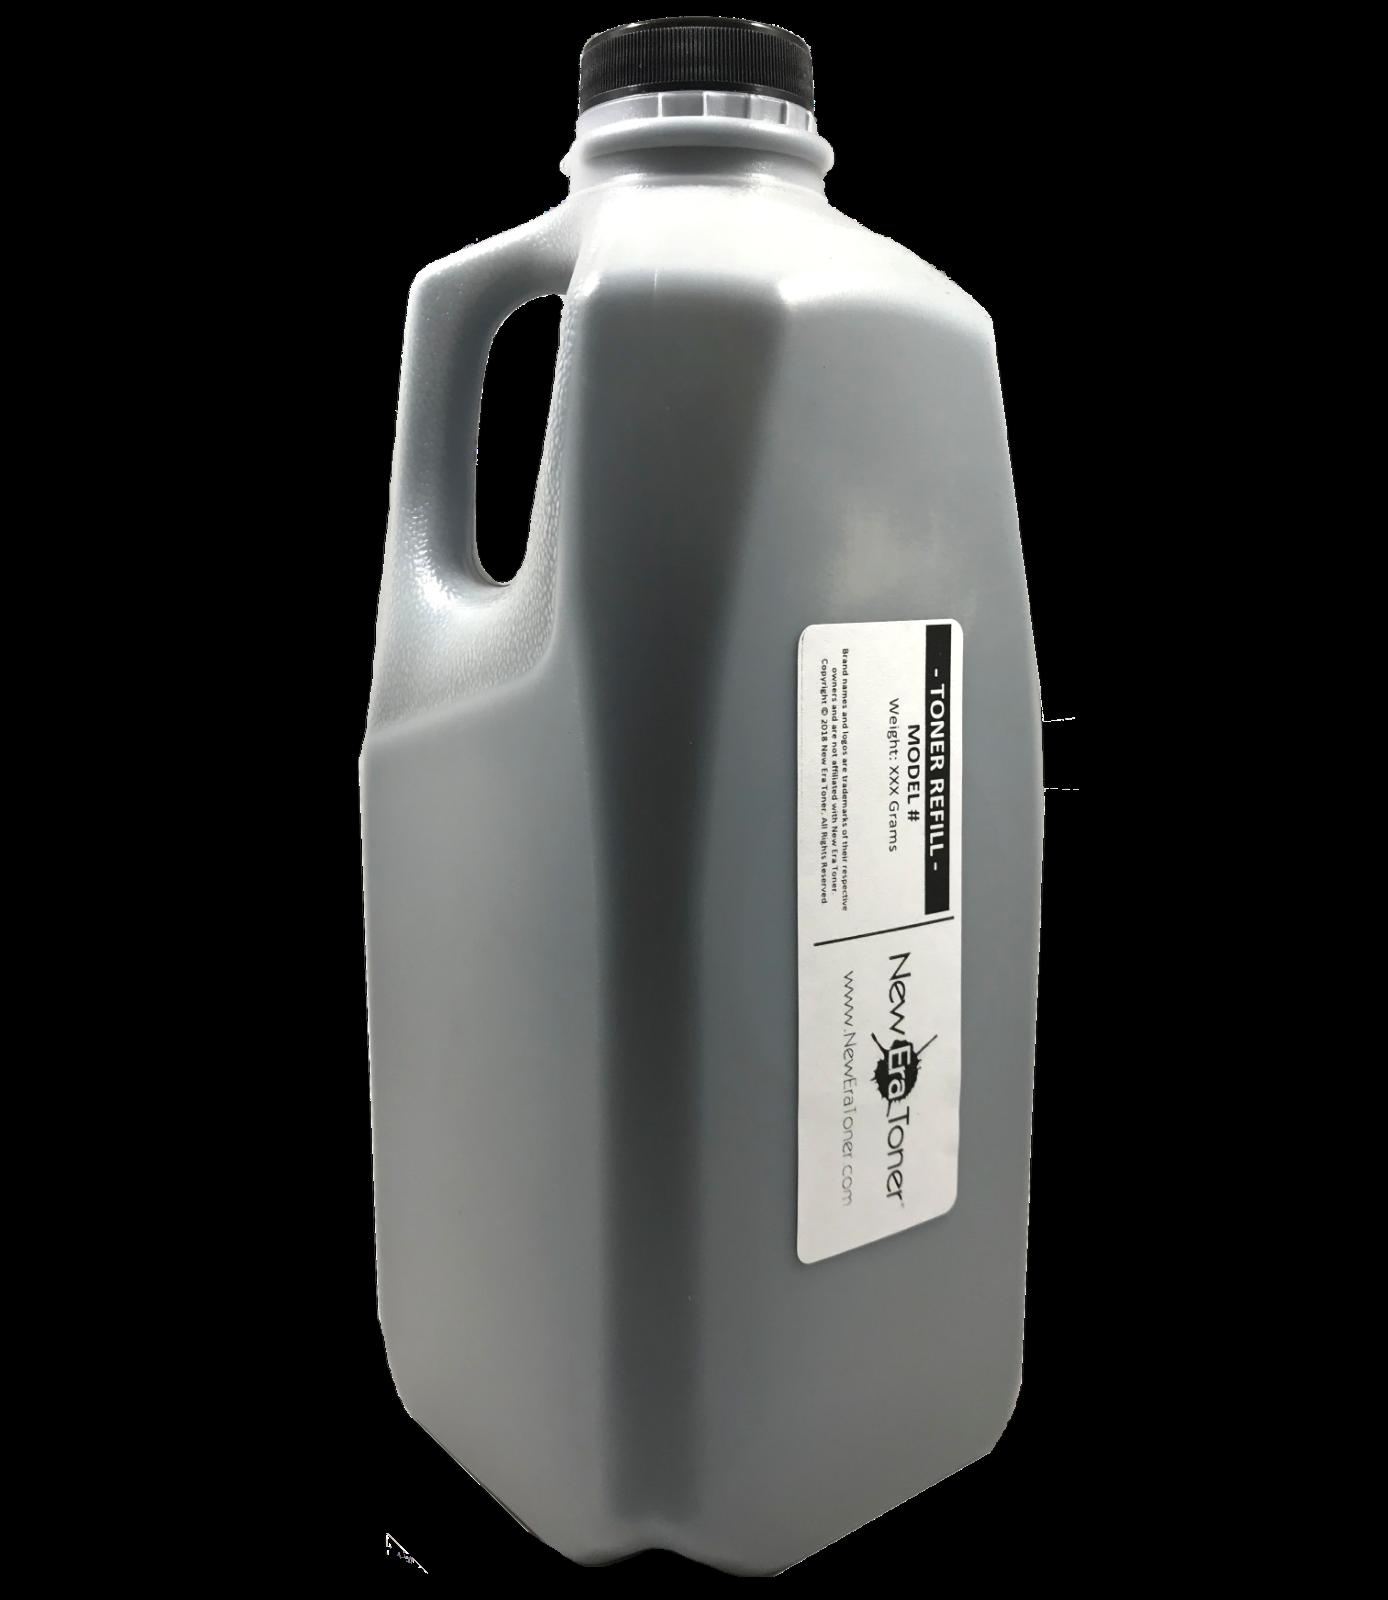 universal black refill kit for brother laser